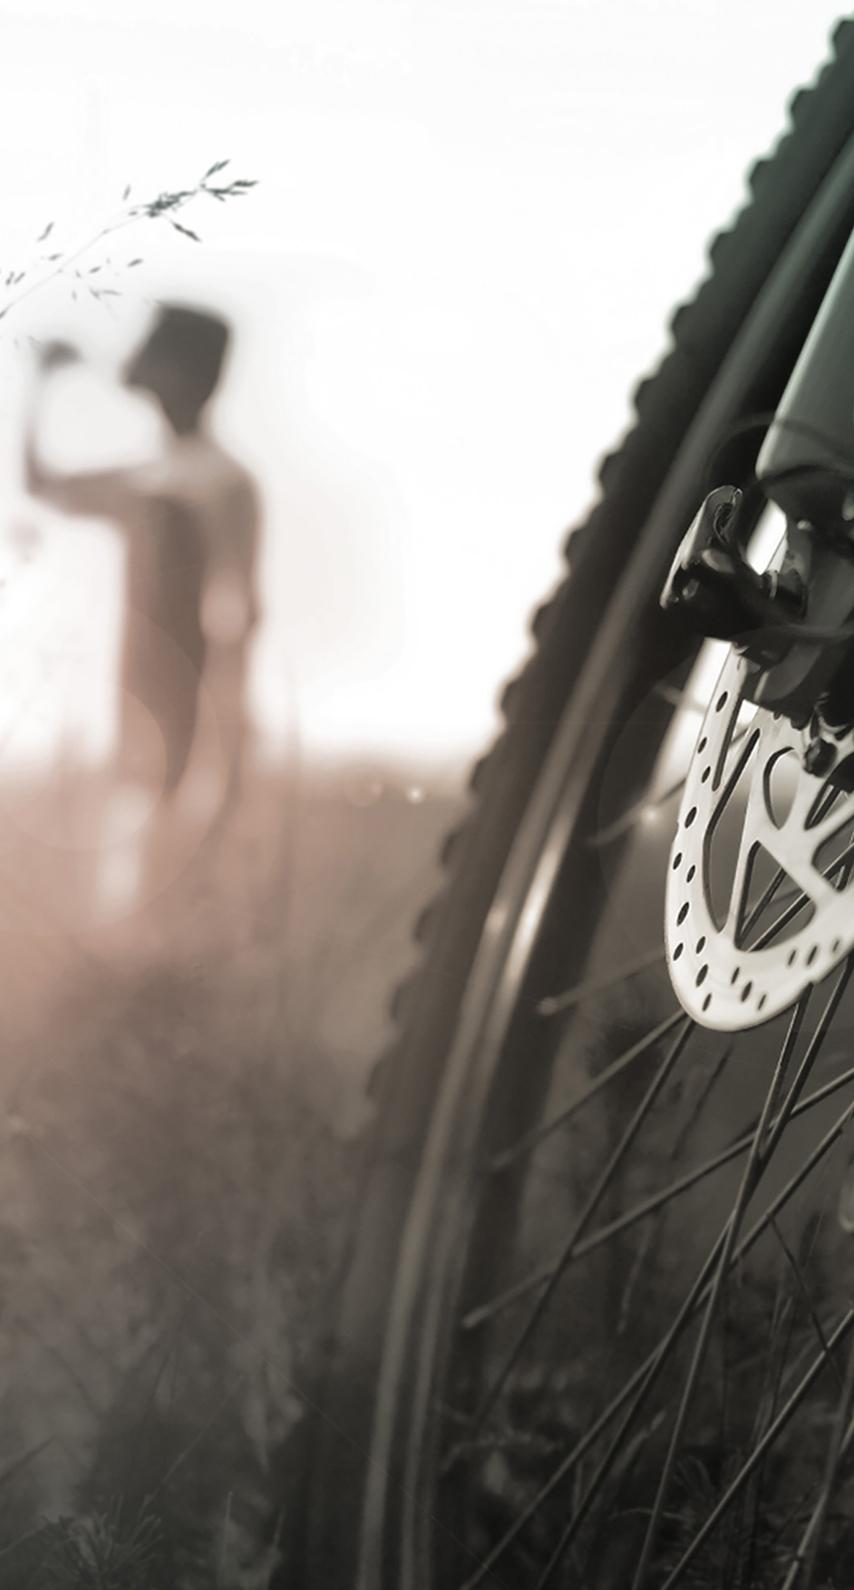 bicycle wheel, bicycle part